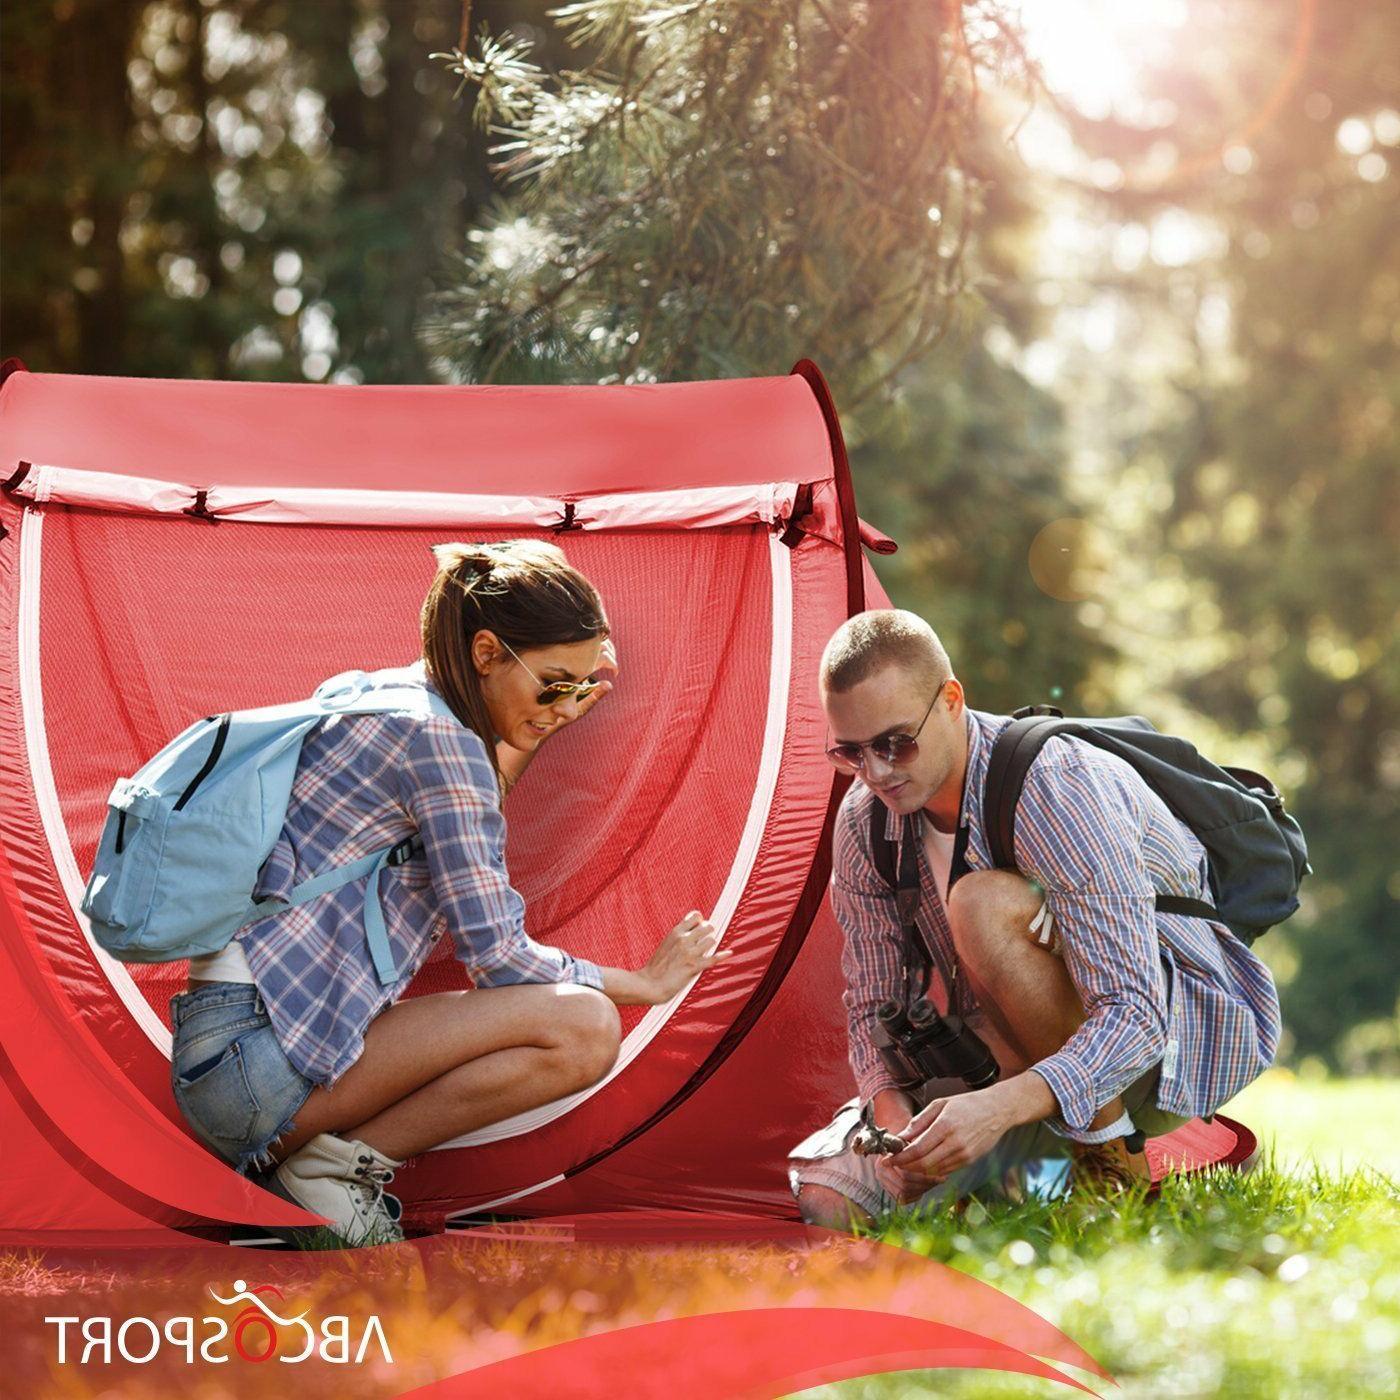 Pop-up Tent Automatic Instant Cabana Tent - Suitable 2